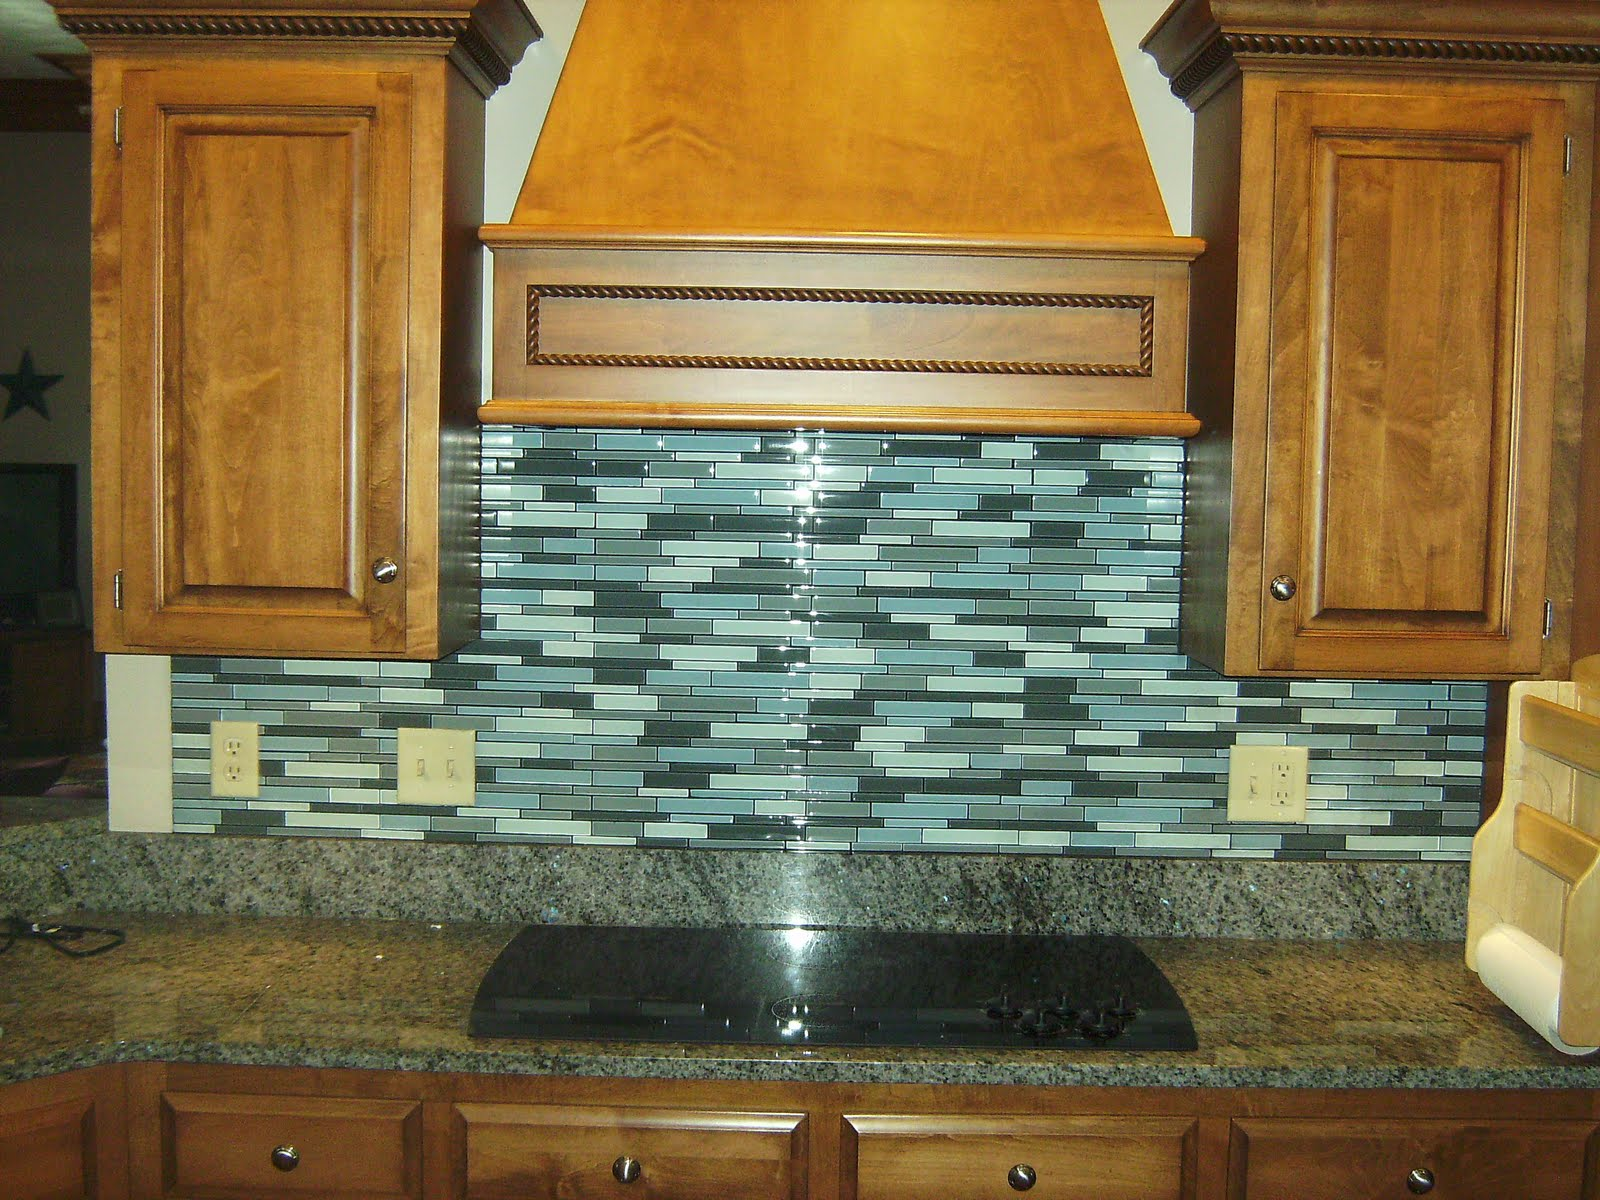 Glass Tile Kitchen Backsplash Caddy Knapp And Flooring Inc